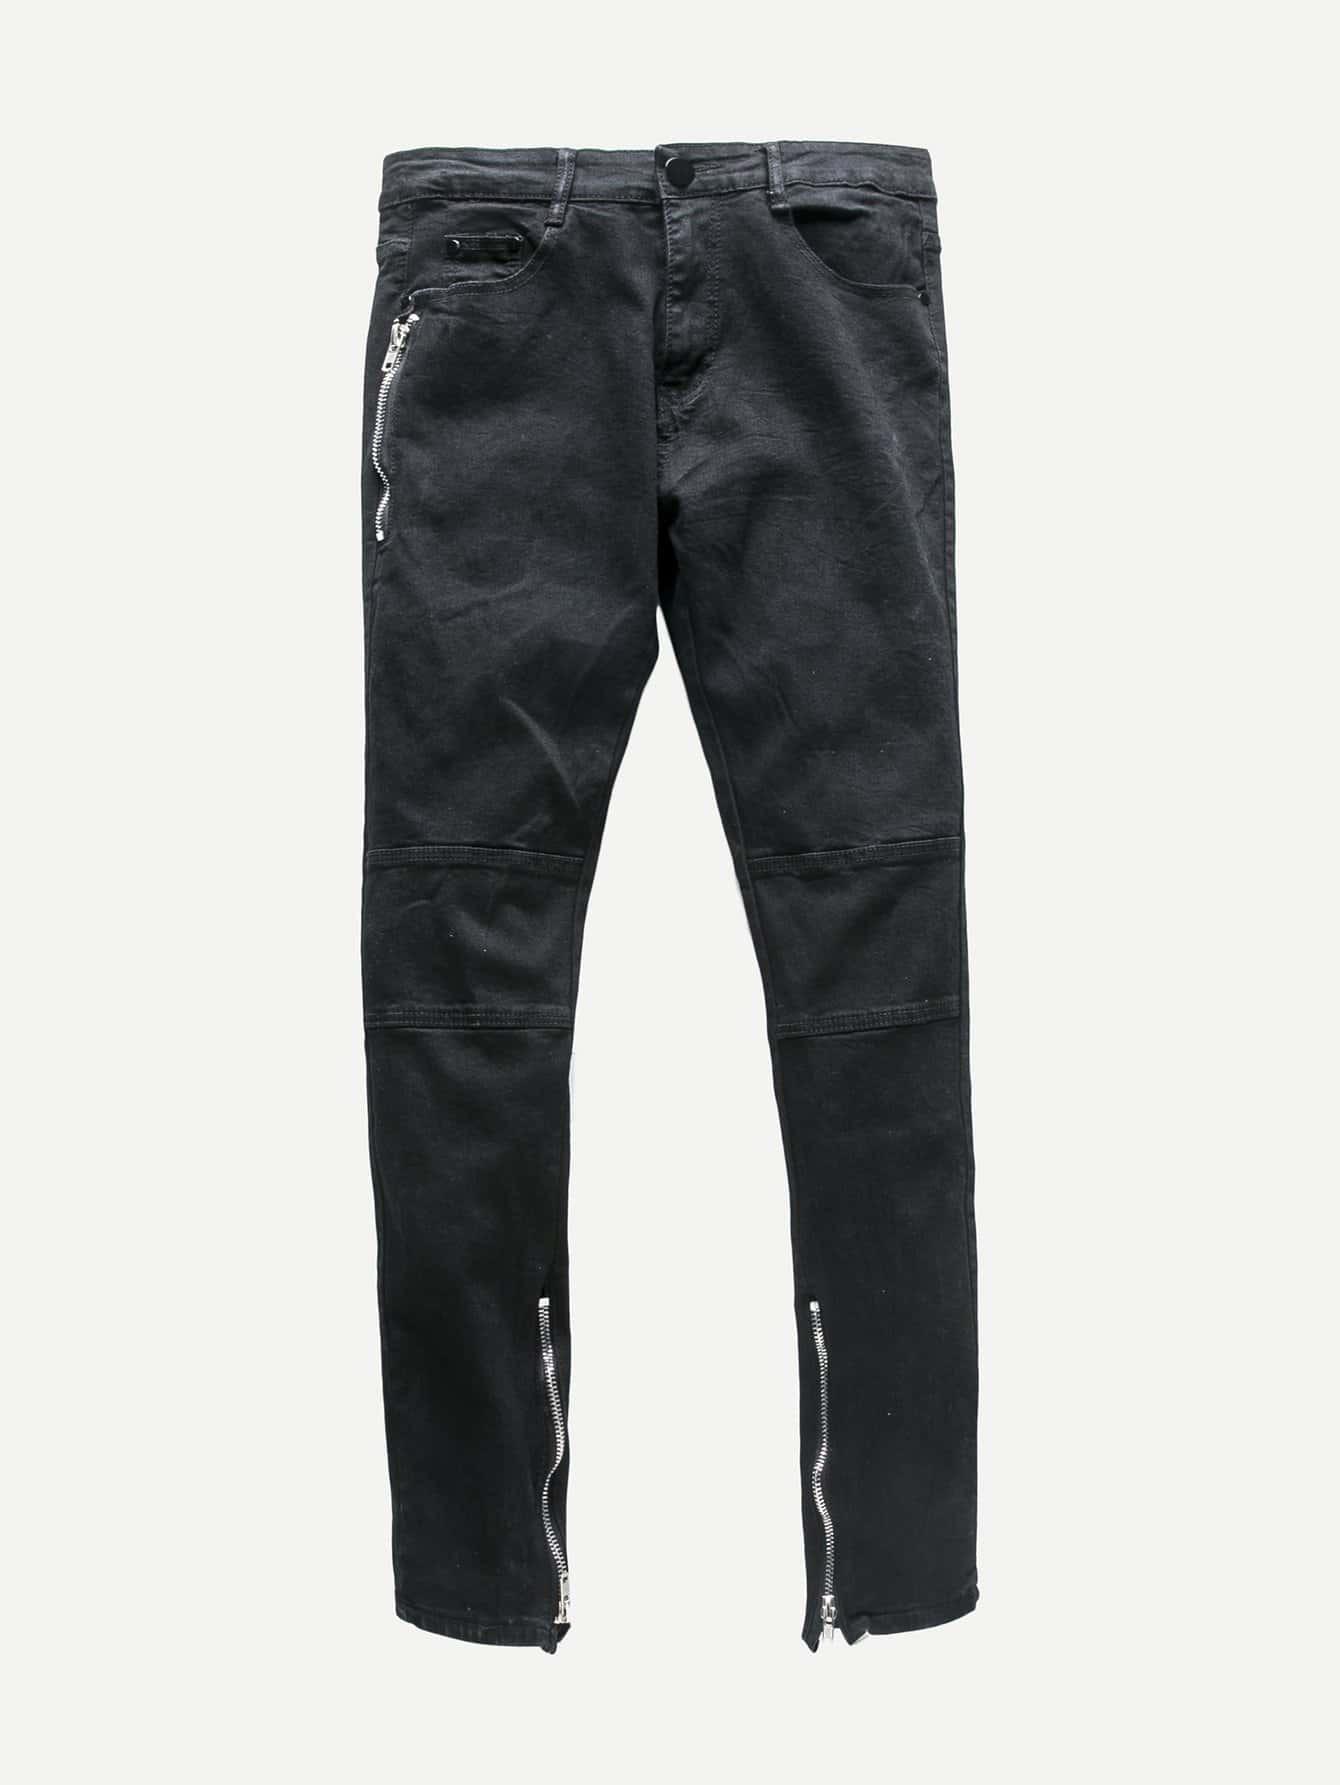 Men Zip Decoration Skinny Jeans 2017 new men s classic jeans straight full length casual hip hop zip pocket biker jeans fashion slim skinny jeans men big sizes